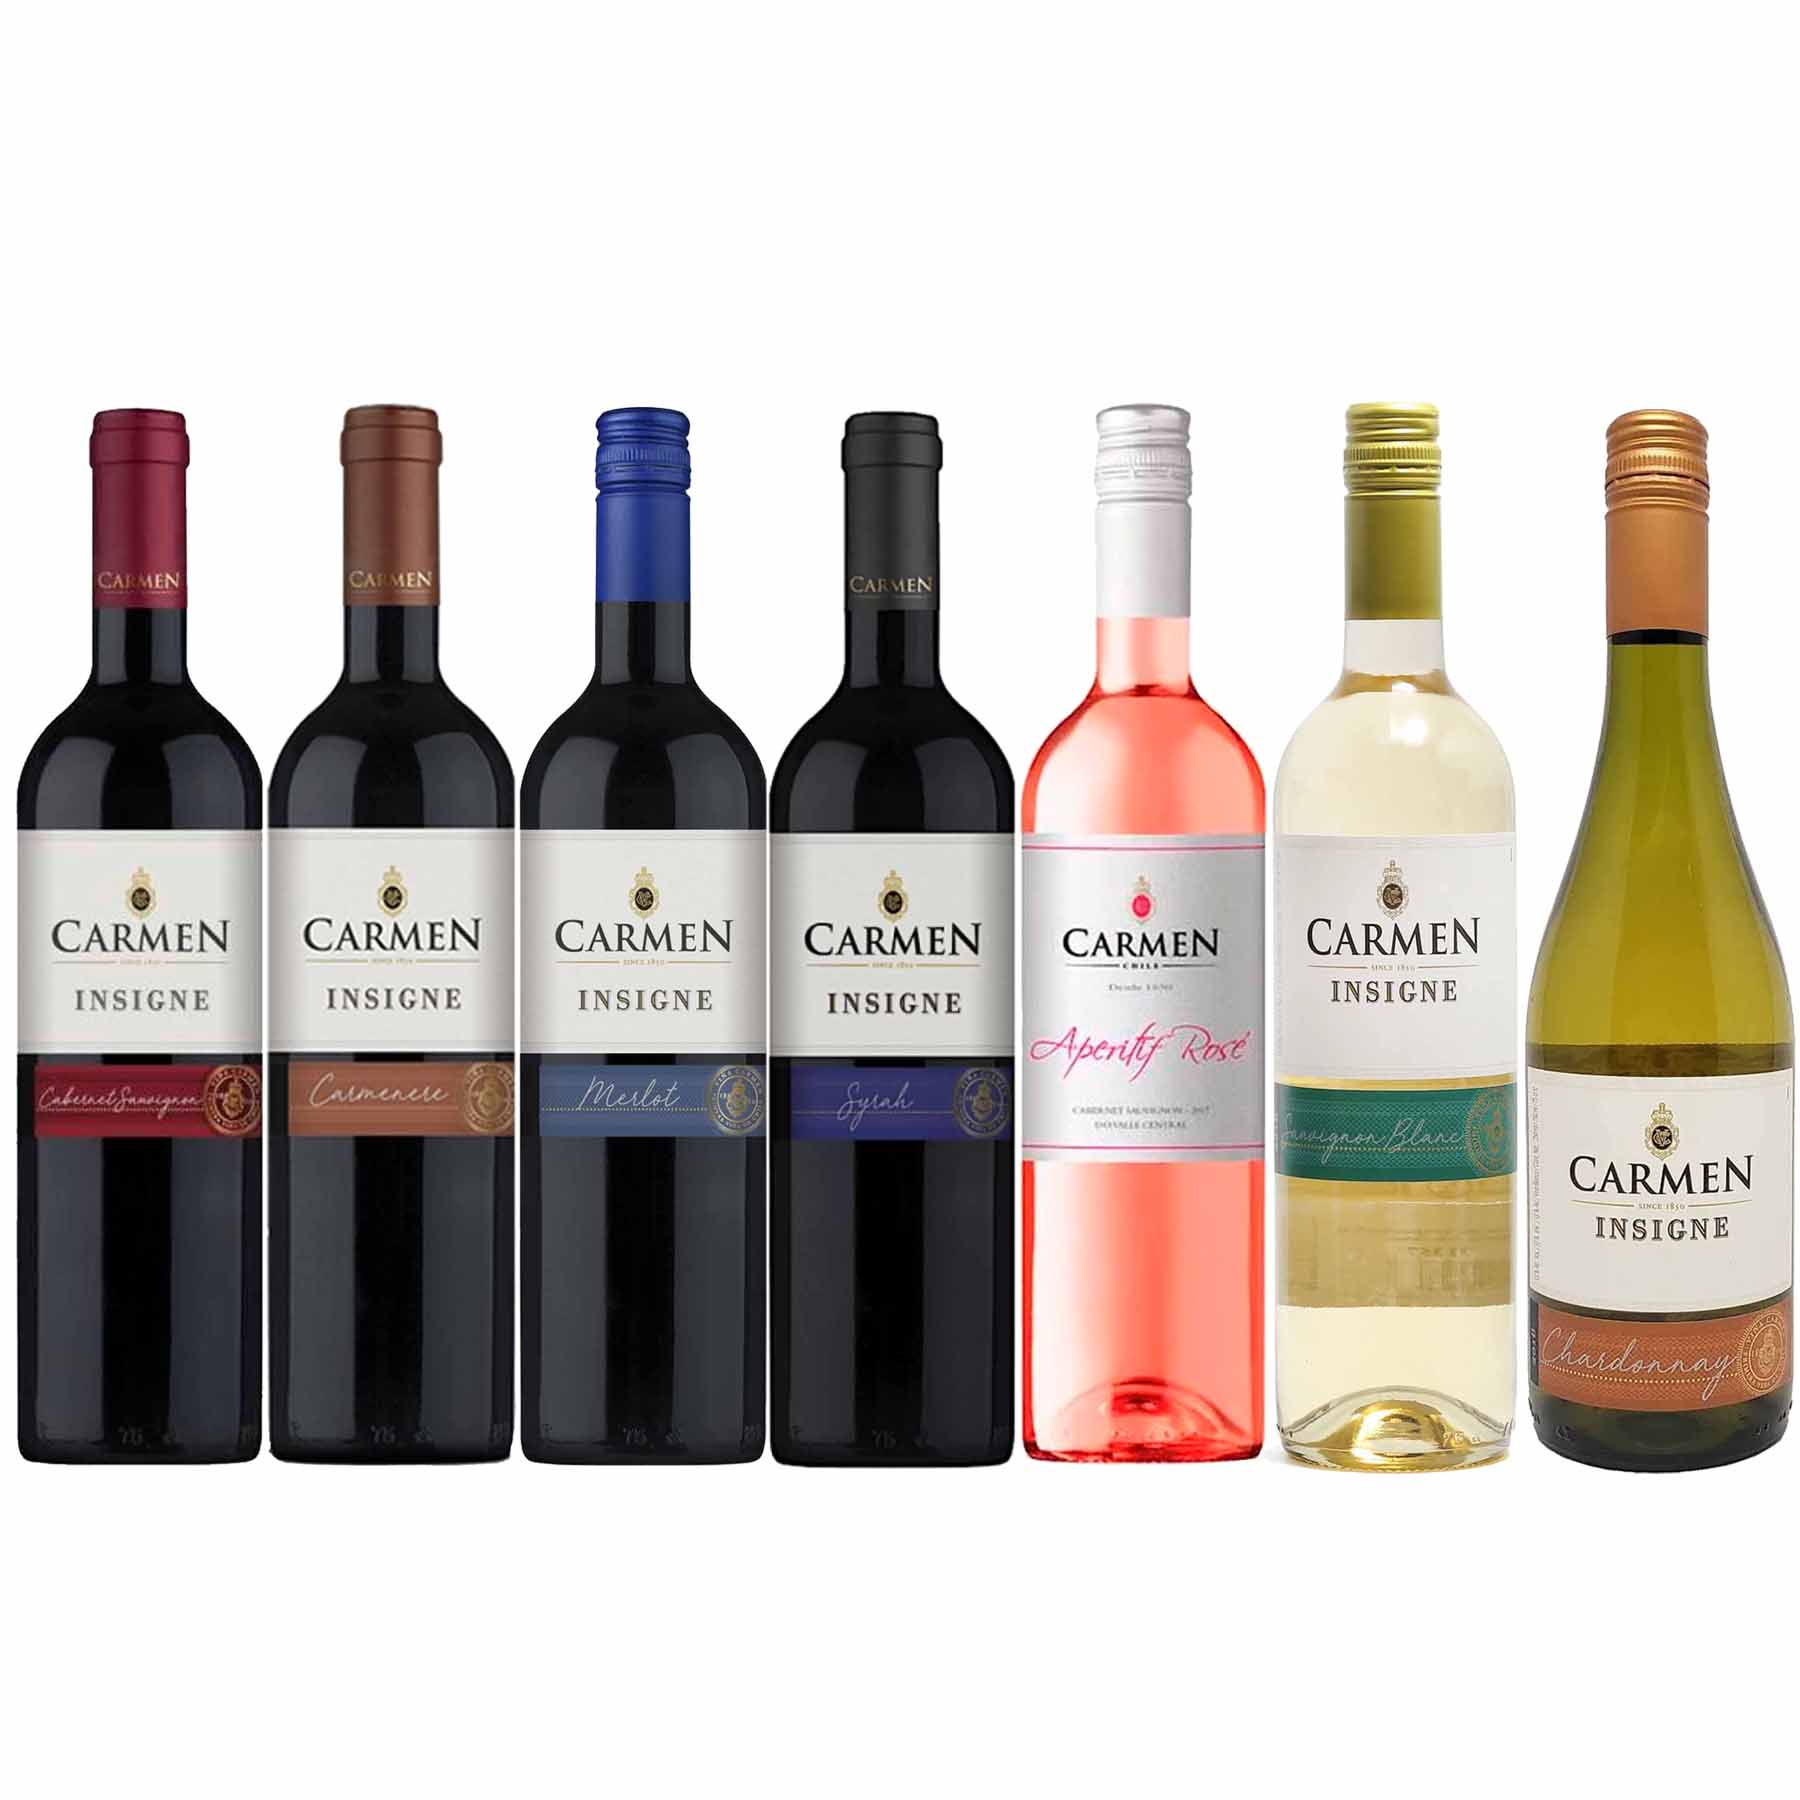 Kit 7 Vinhos Chilenos Carmen Insigne 4 tintos 2 brancos 1 rosé